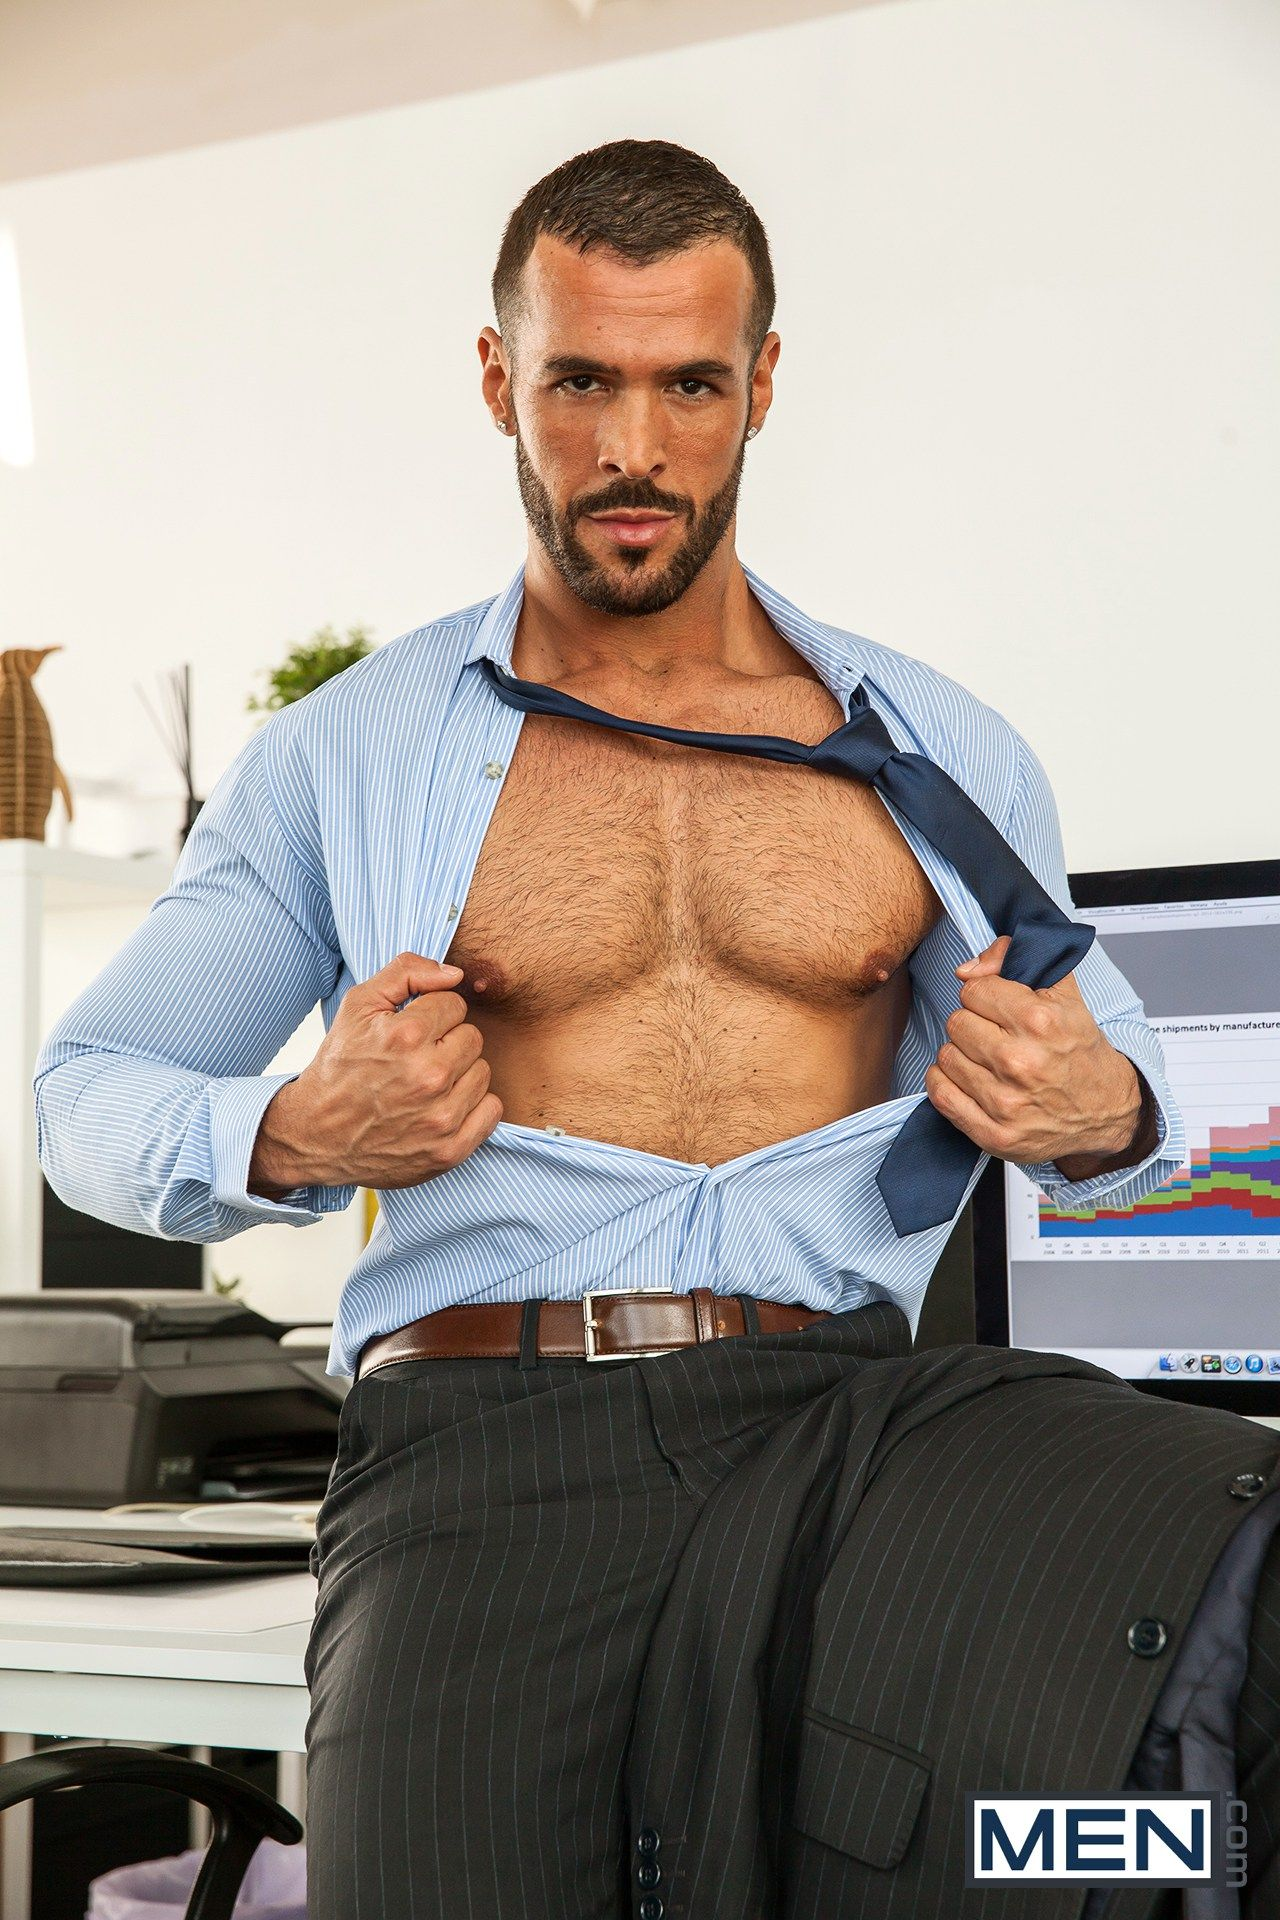 The gay office men